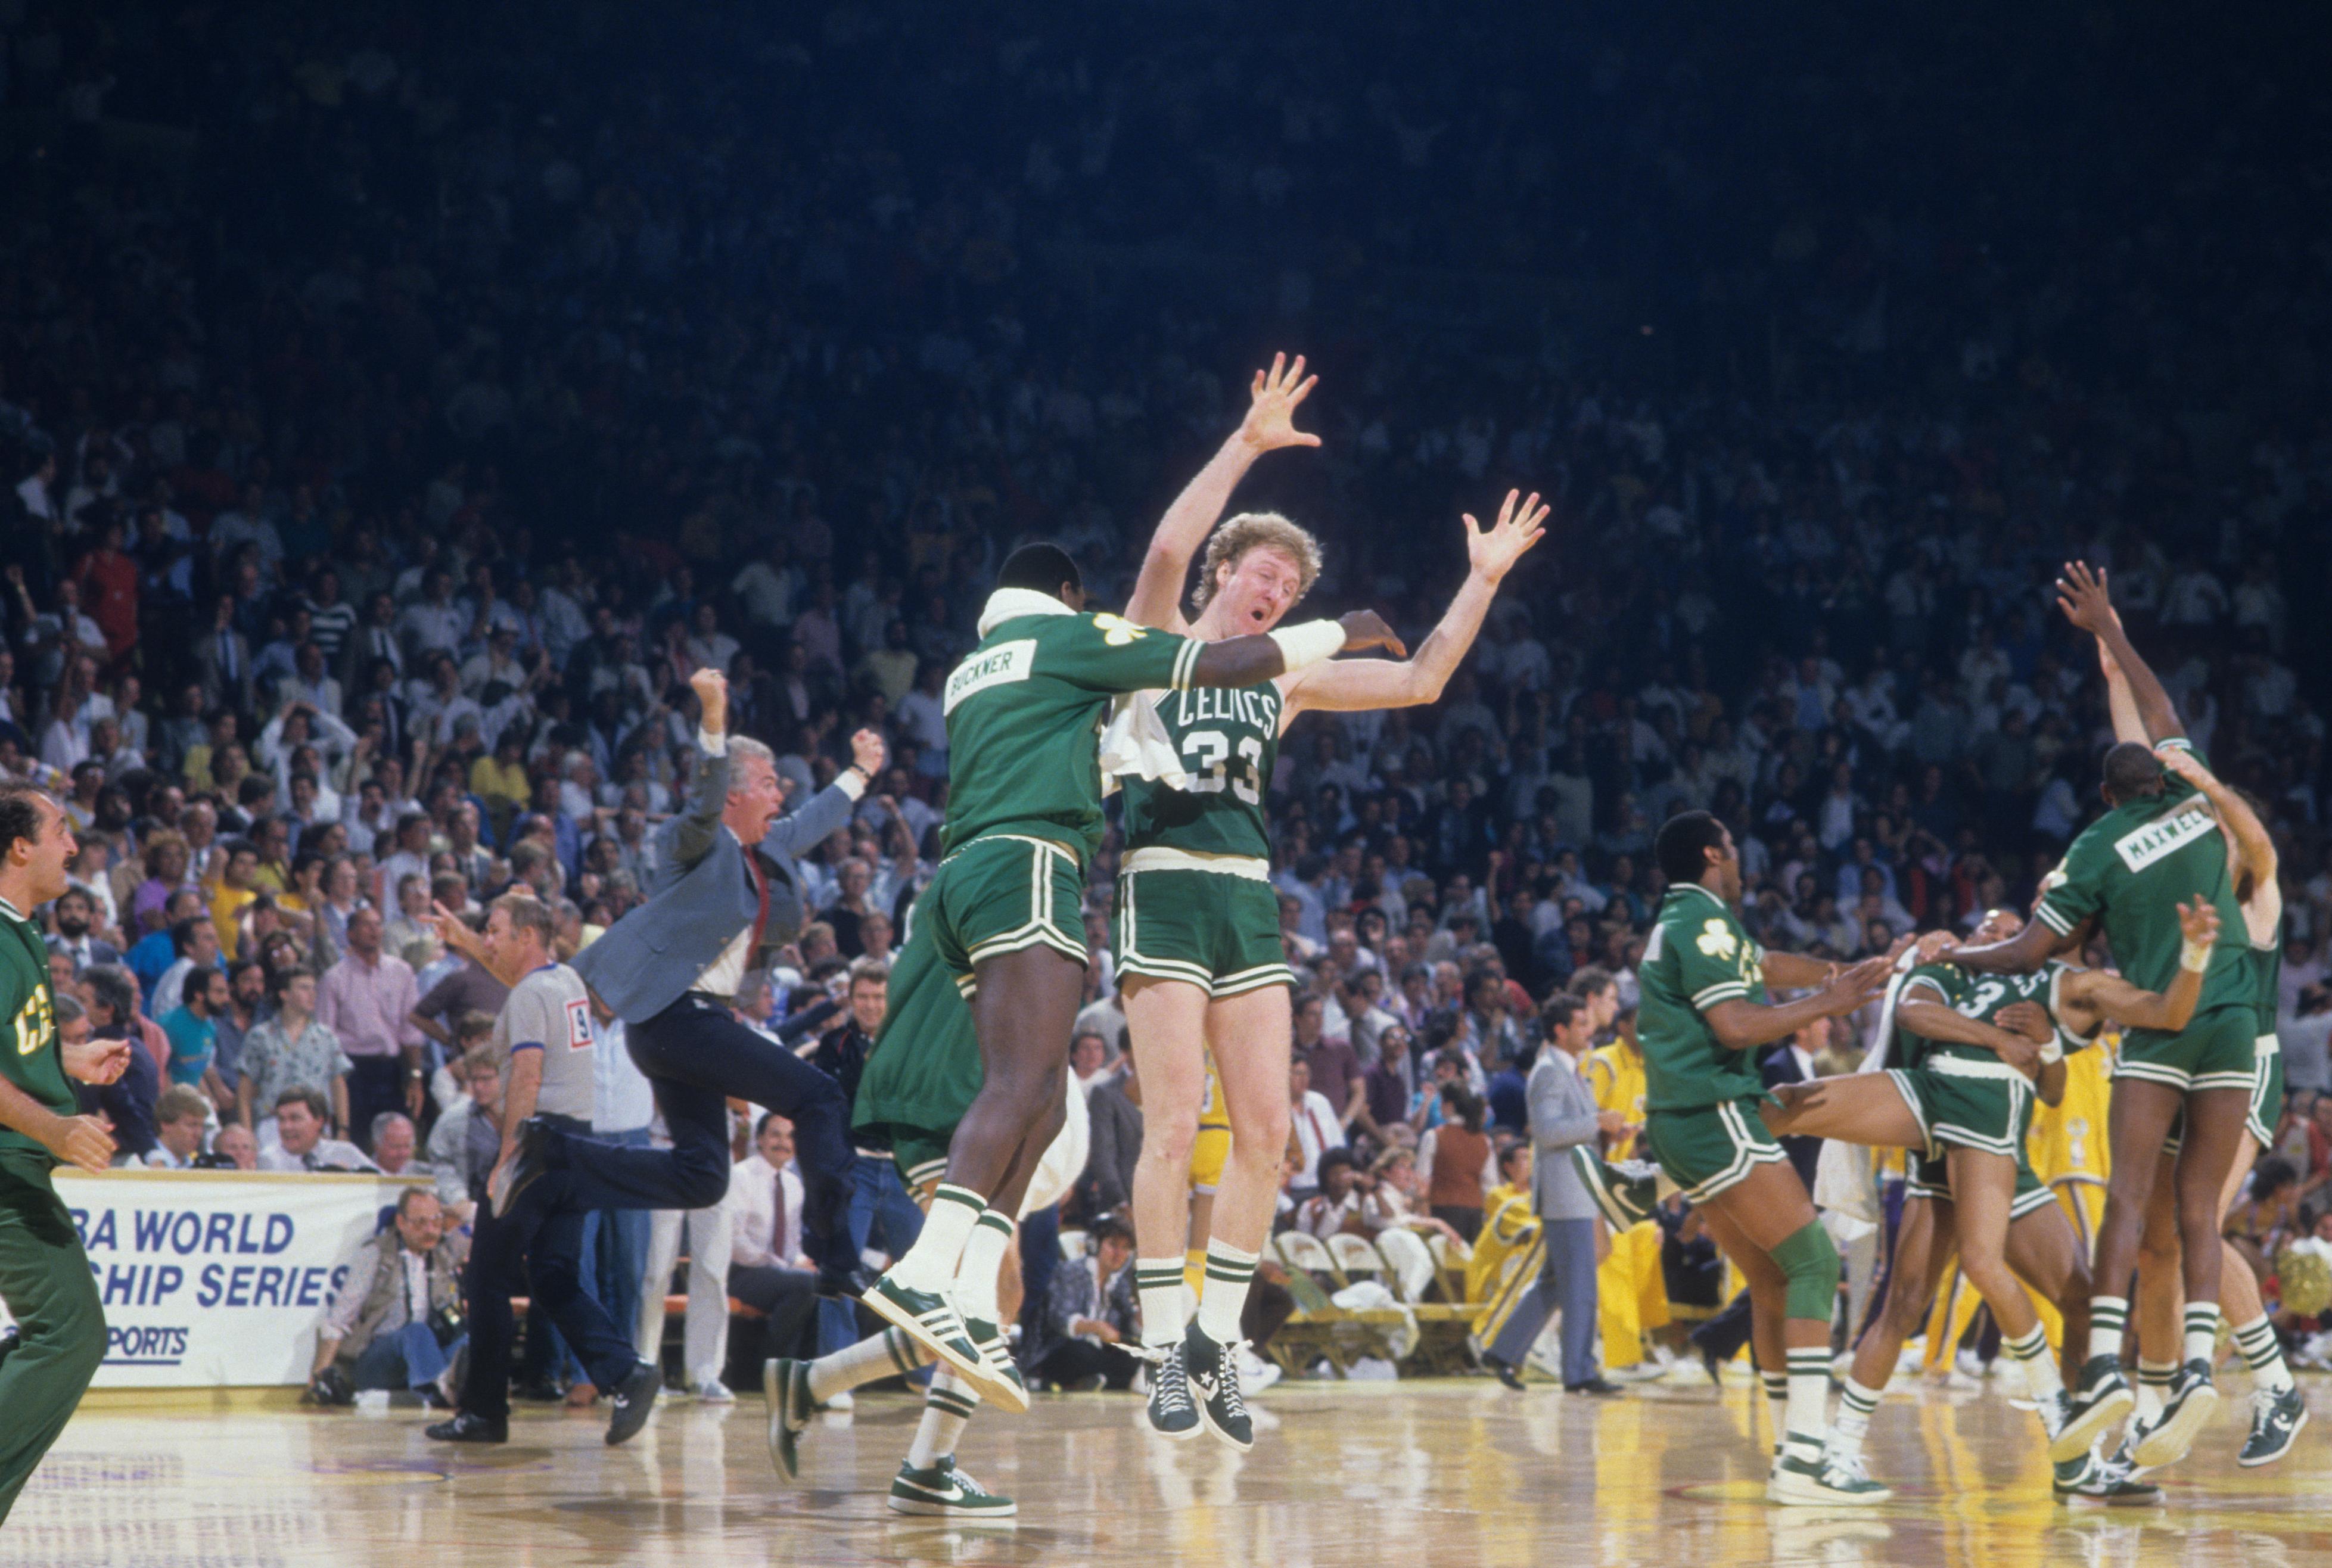 Los Angeles Lakers vs Boston Celtics, 1985 NBA Finals